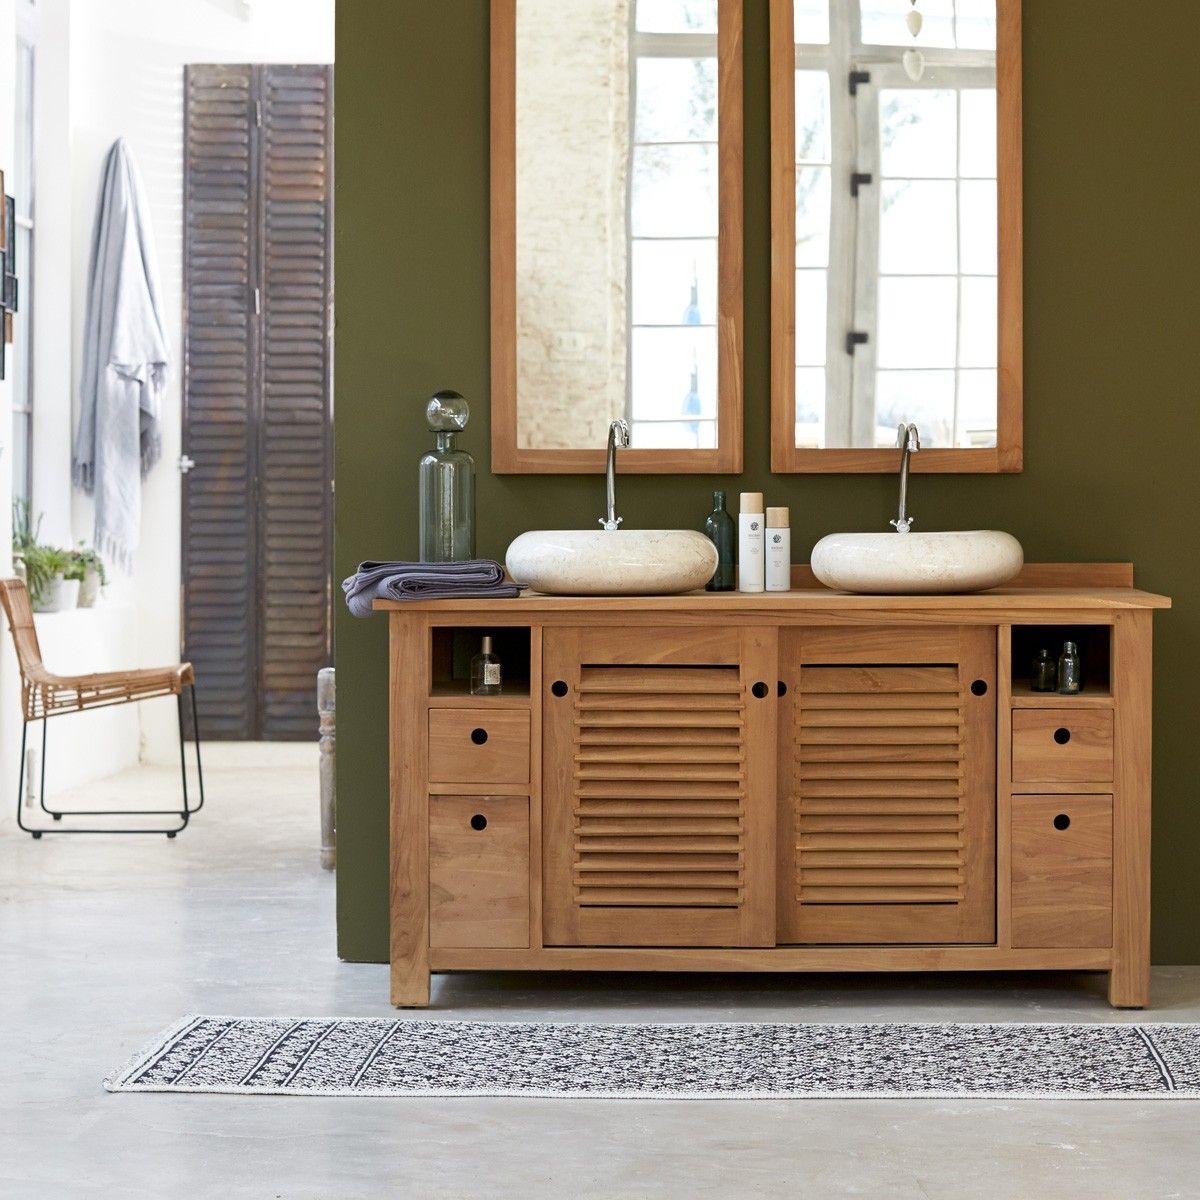 Meuble Salle Bain En Teck Pas Cher Bois Massif Double Vasque Mulchbrothers Tikamoon Teak Living Room Teak Bathroom